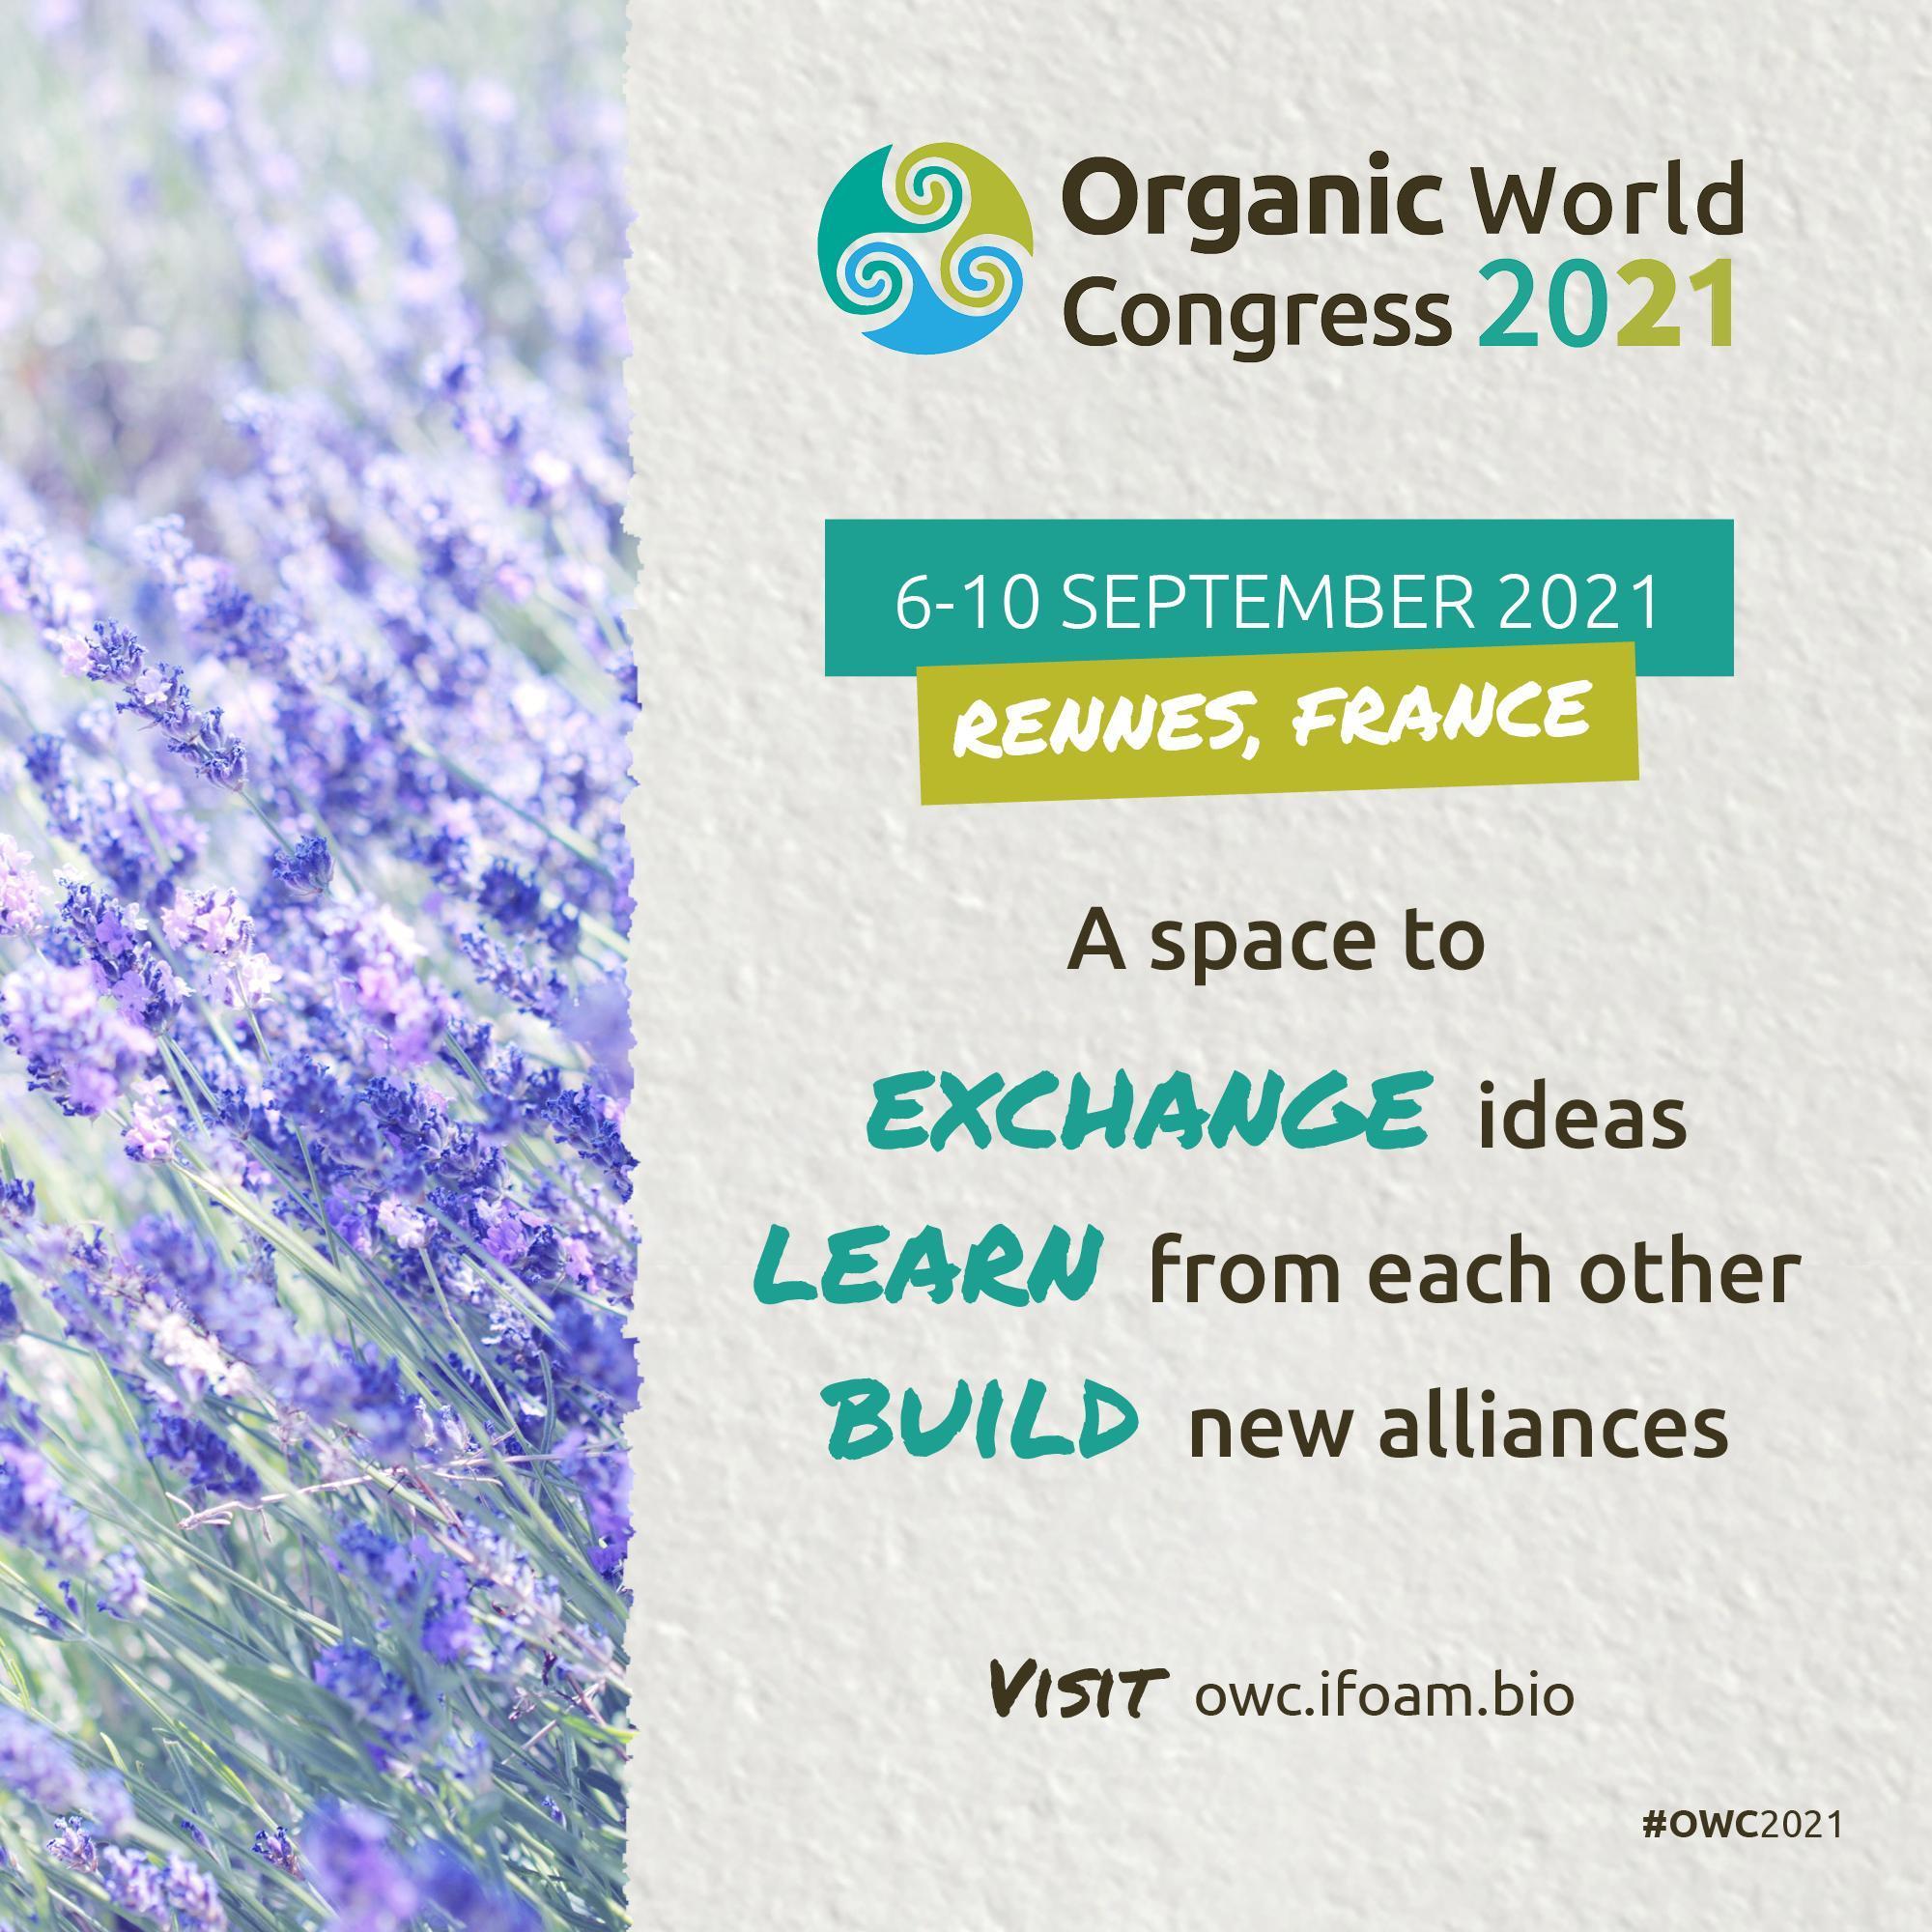 OWC2021 Organic world congress 2021 IFOAM